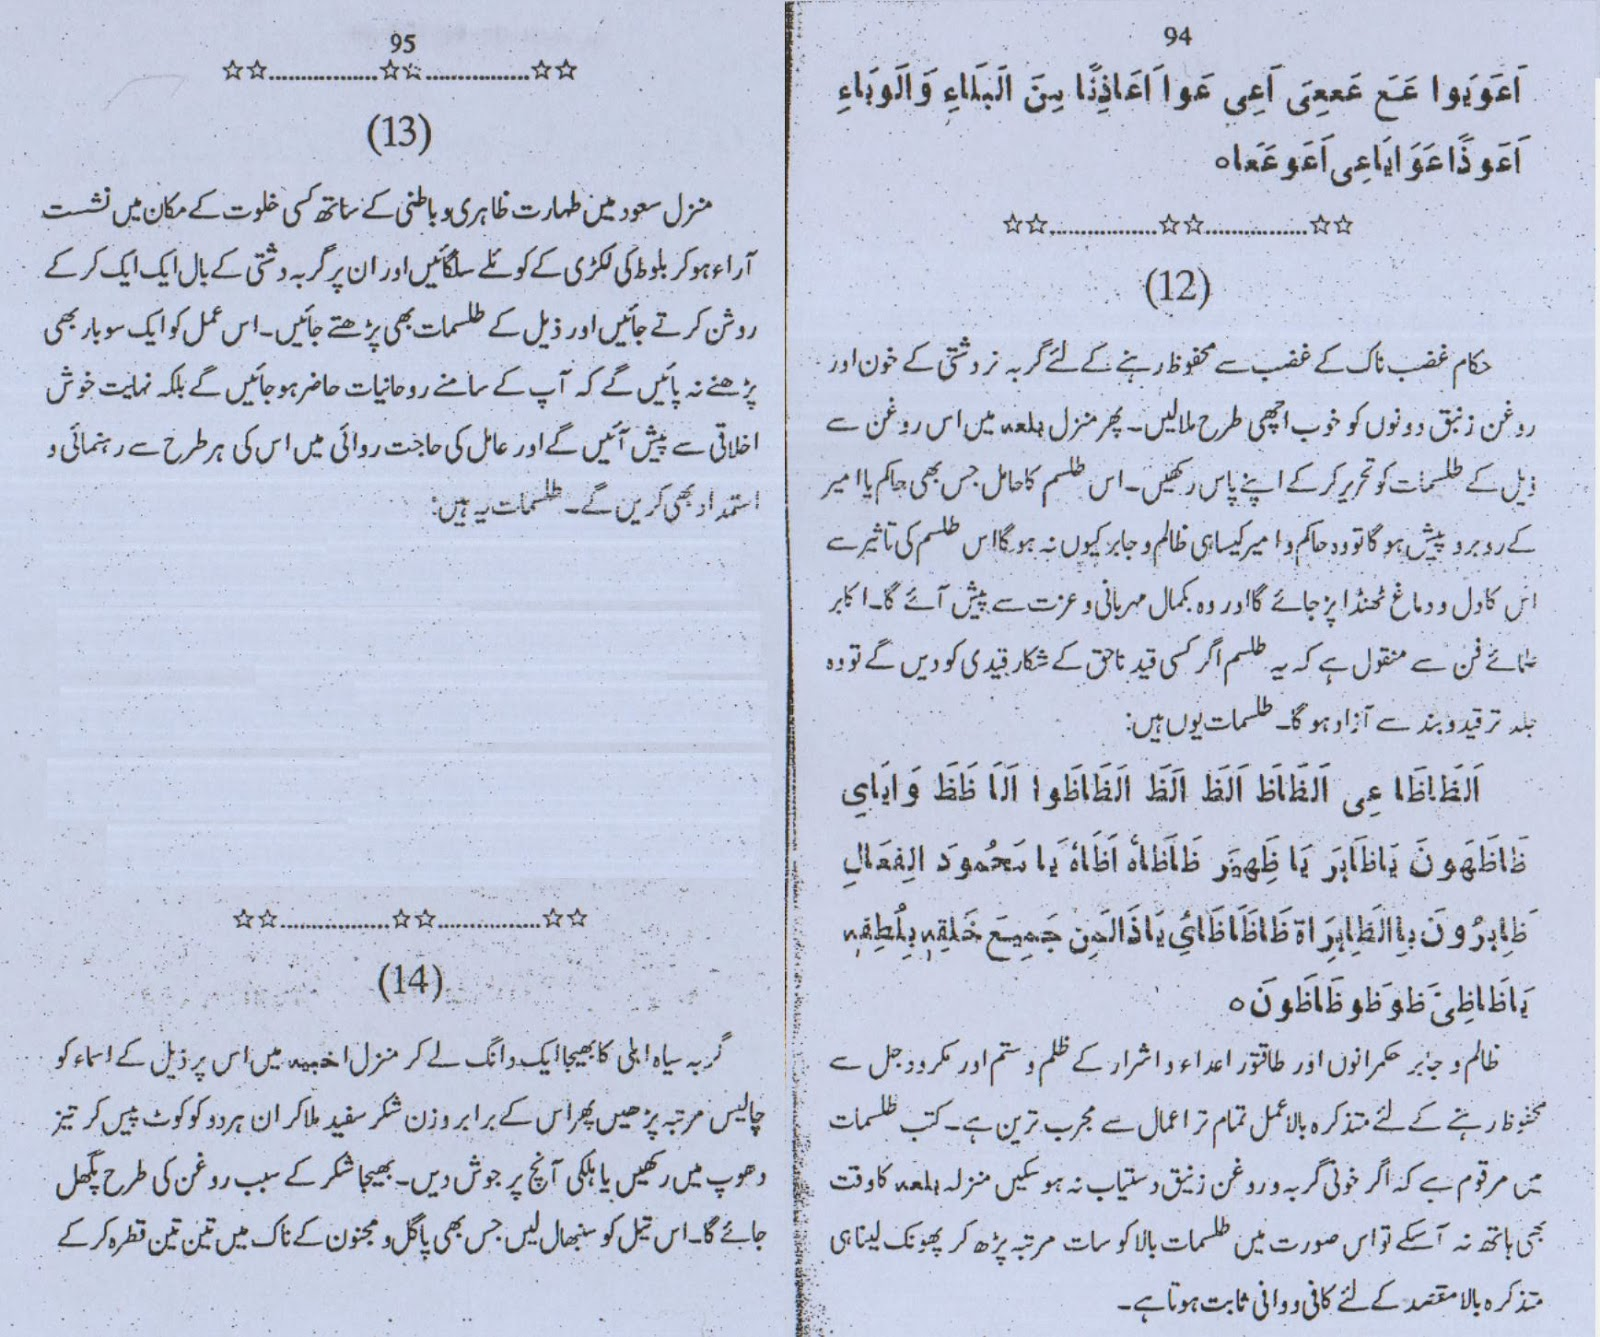 005 Swscan00004 Jpg Harkat Mein Barkat Essay In Urdu Amazing On Topic Hai Short Full